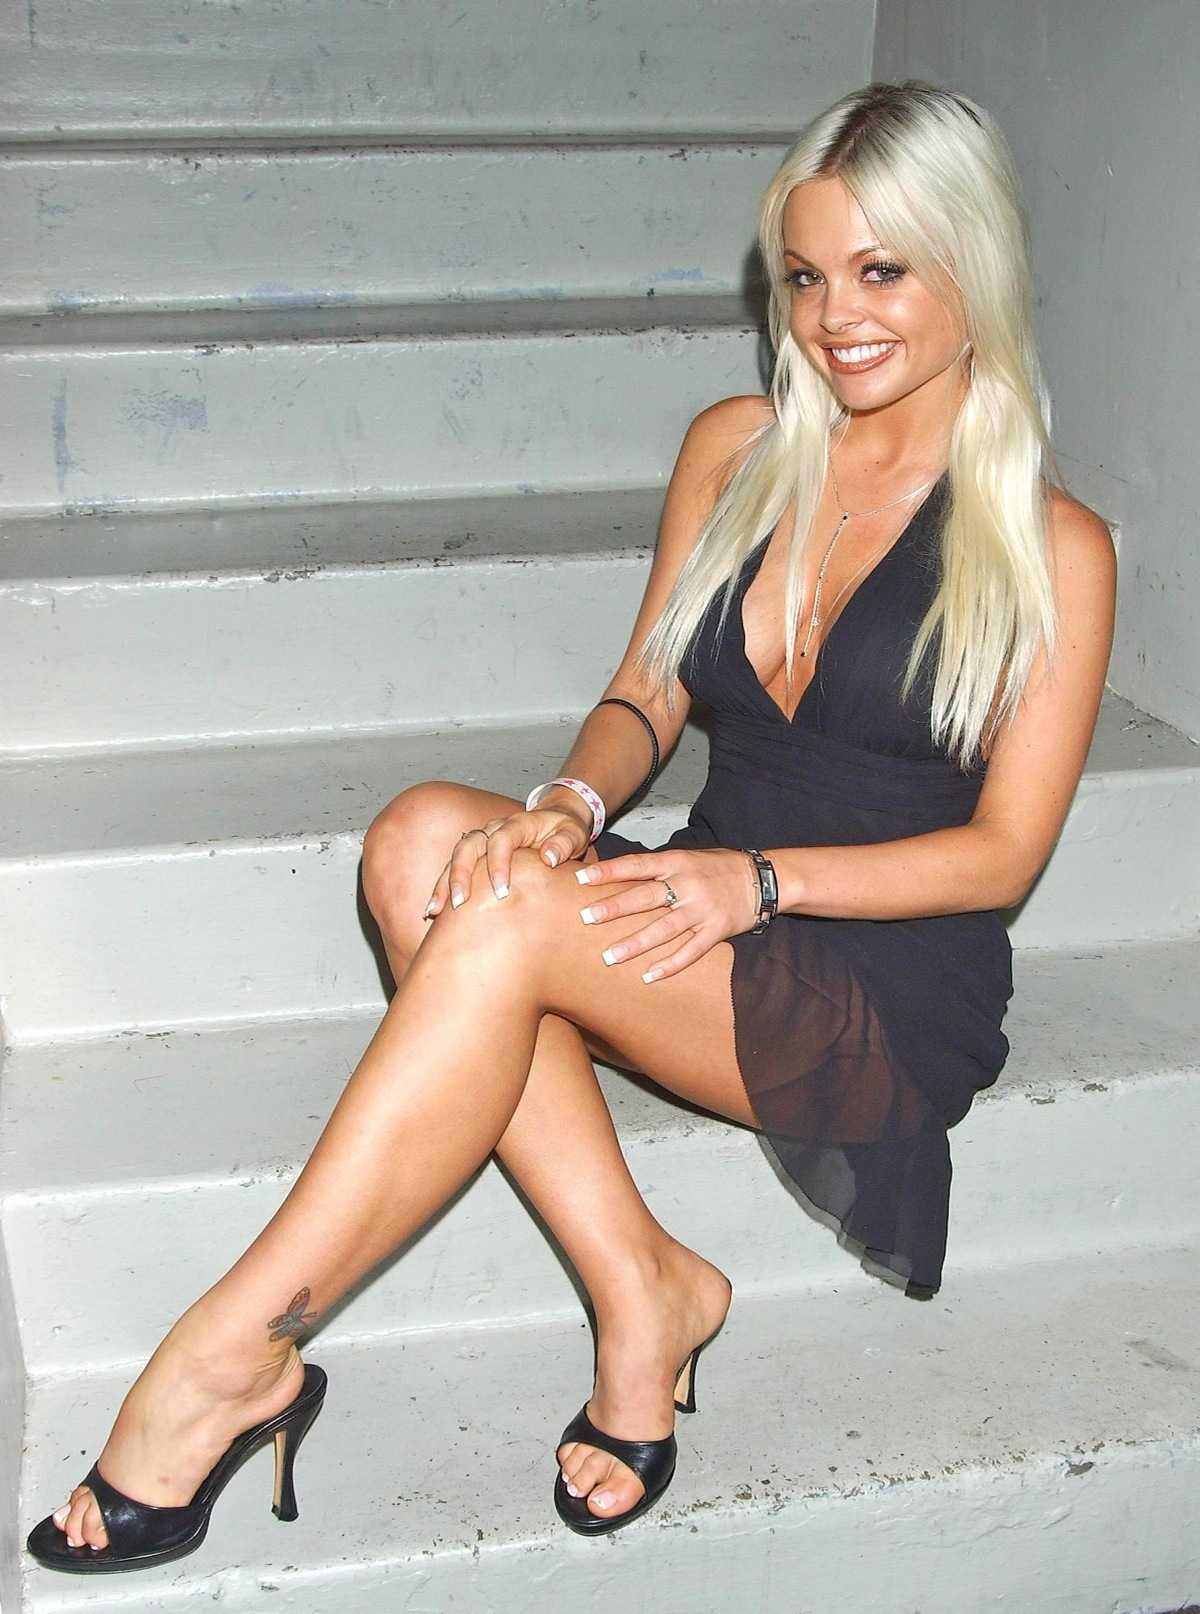 Jesse Jane sexy feet pic